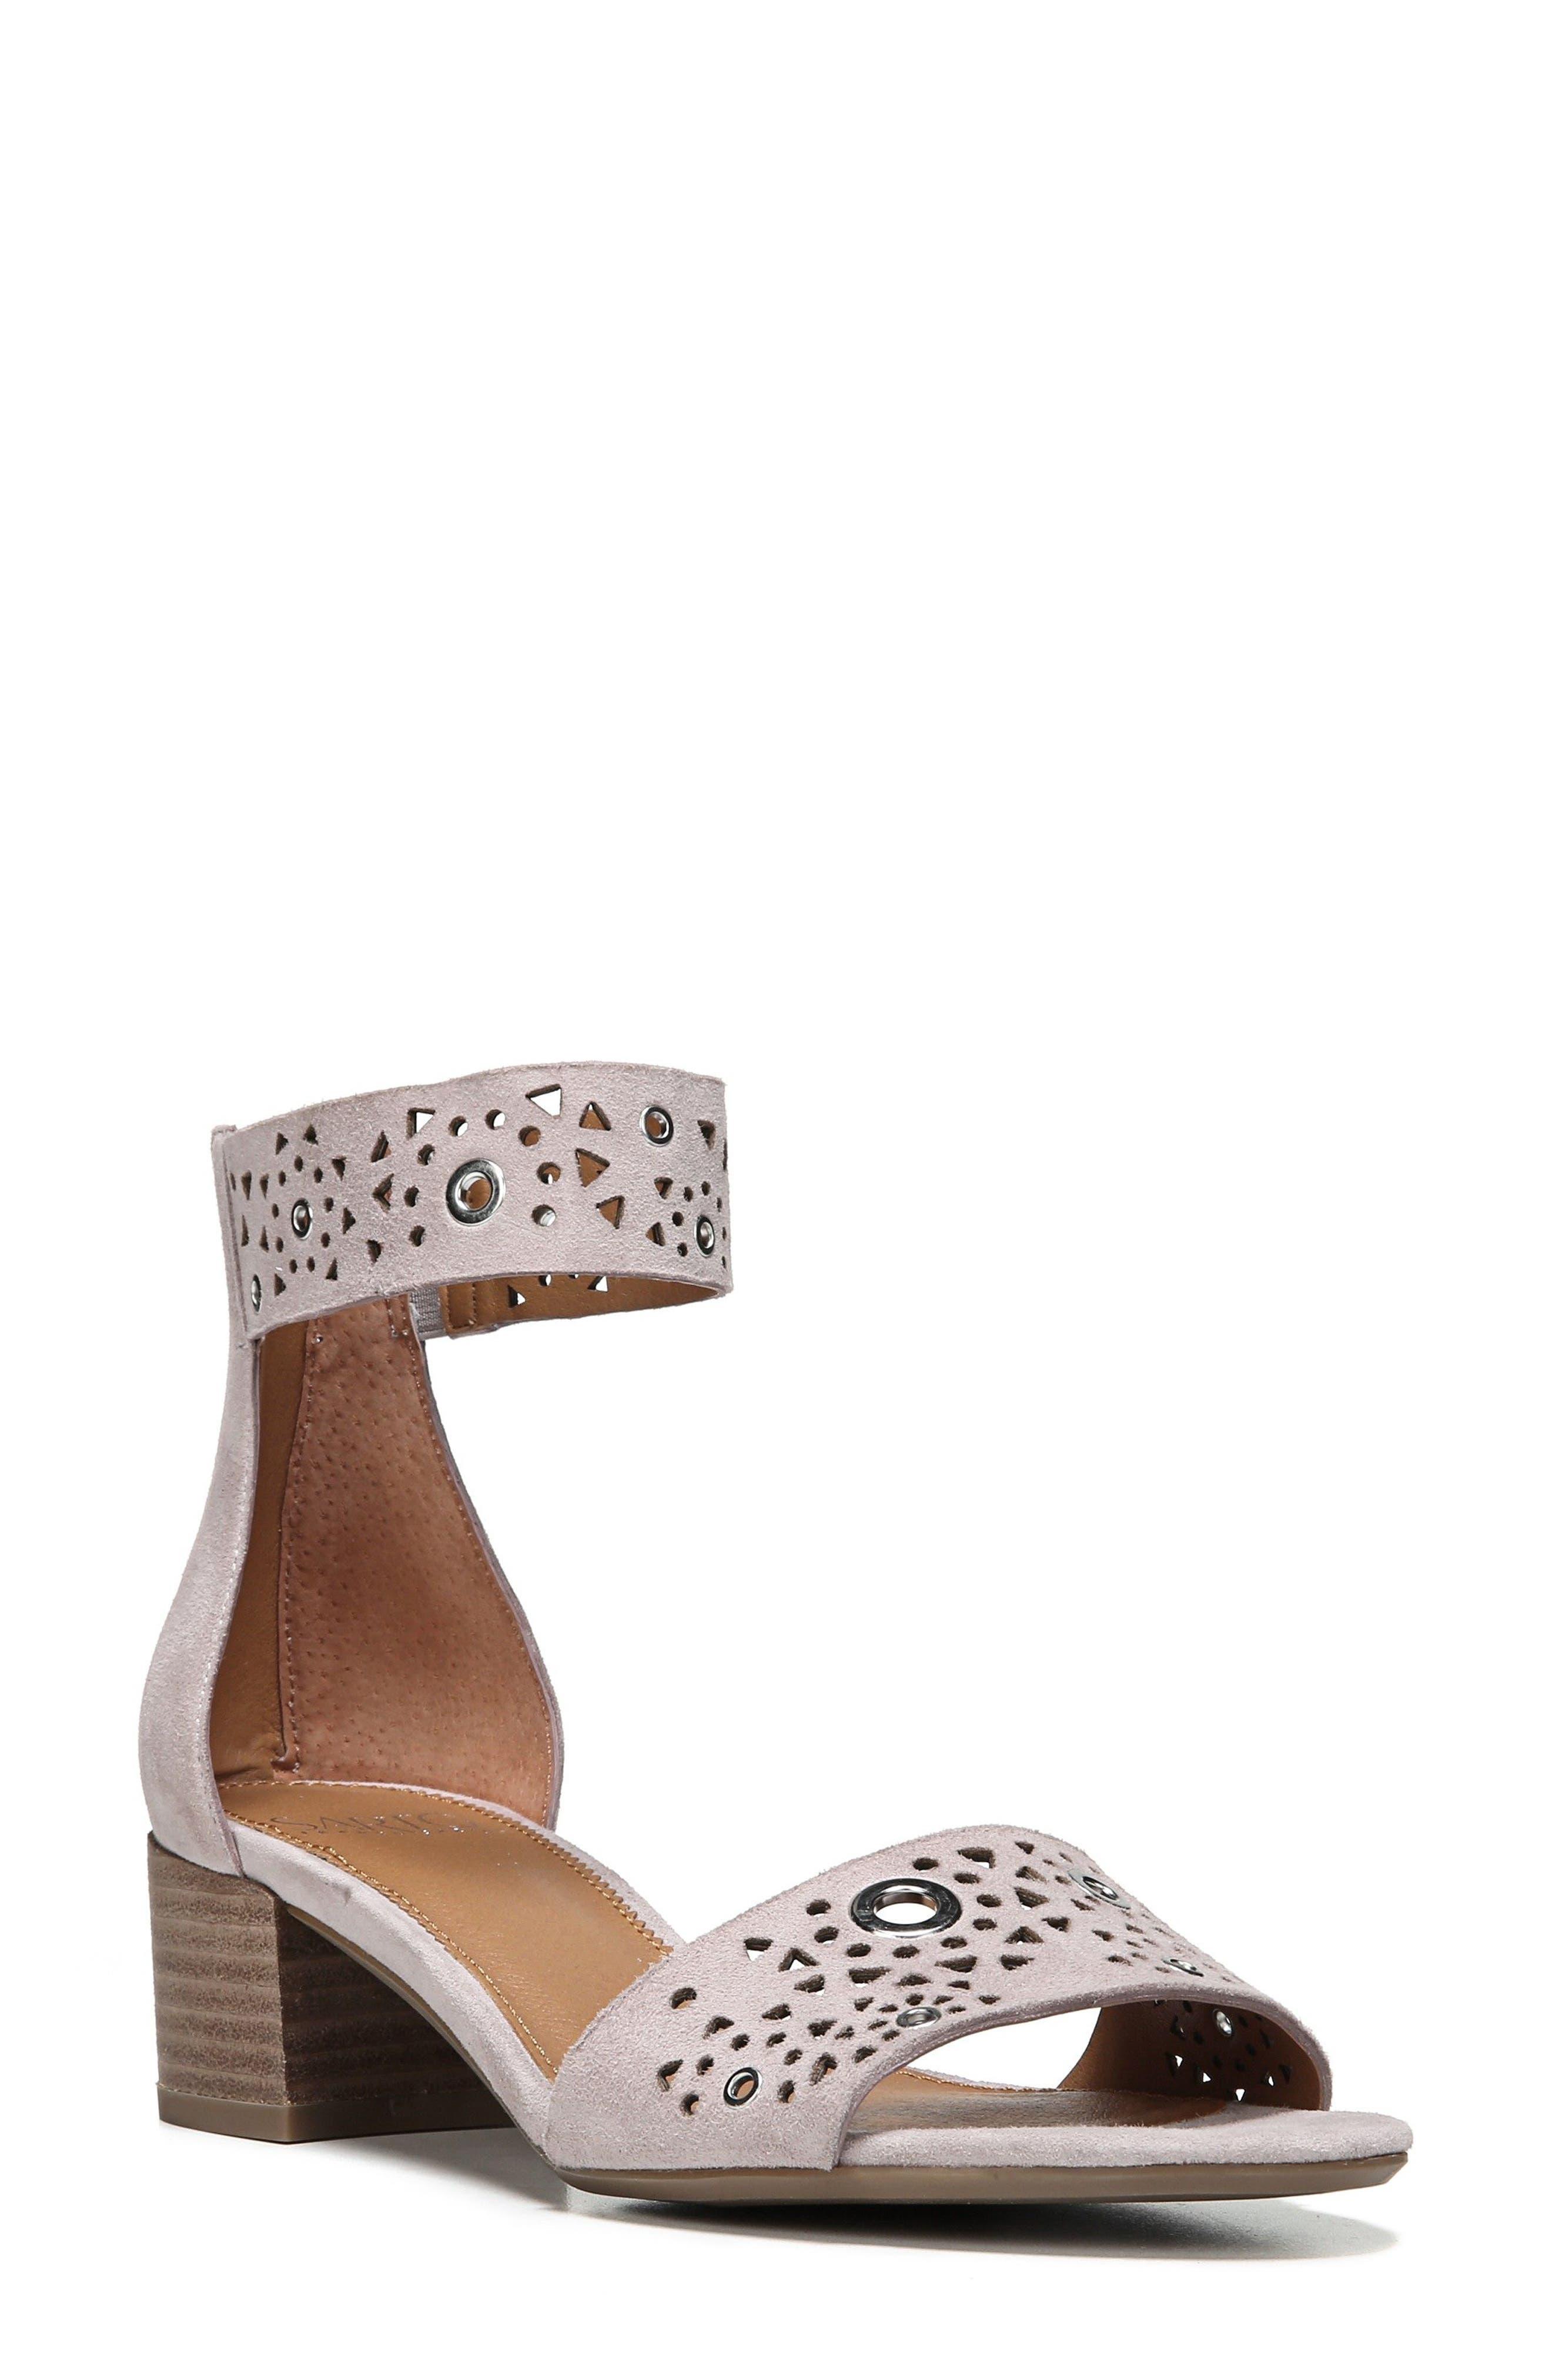 SARTO BY FRANCO SARTO 'Fidela' Block Heel Sandal